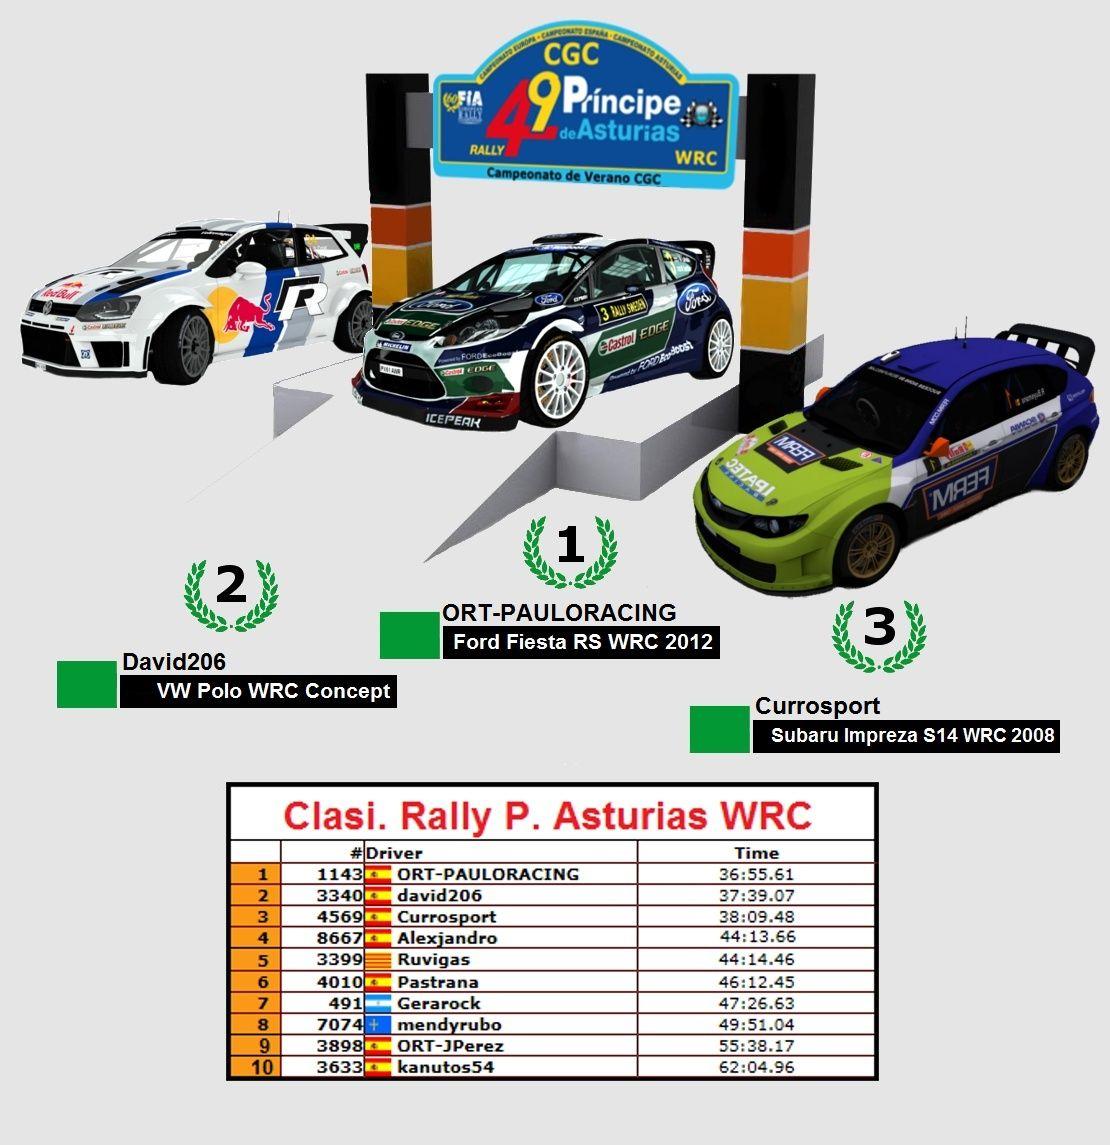 Clasificaciones Generales Minicampeonato de verano RBR2014 Podium17